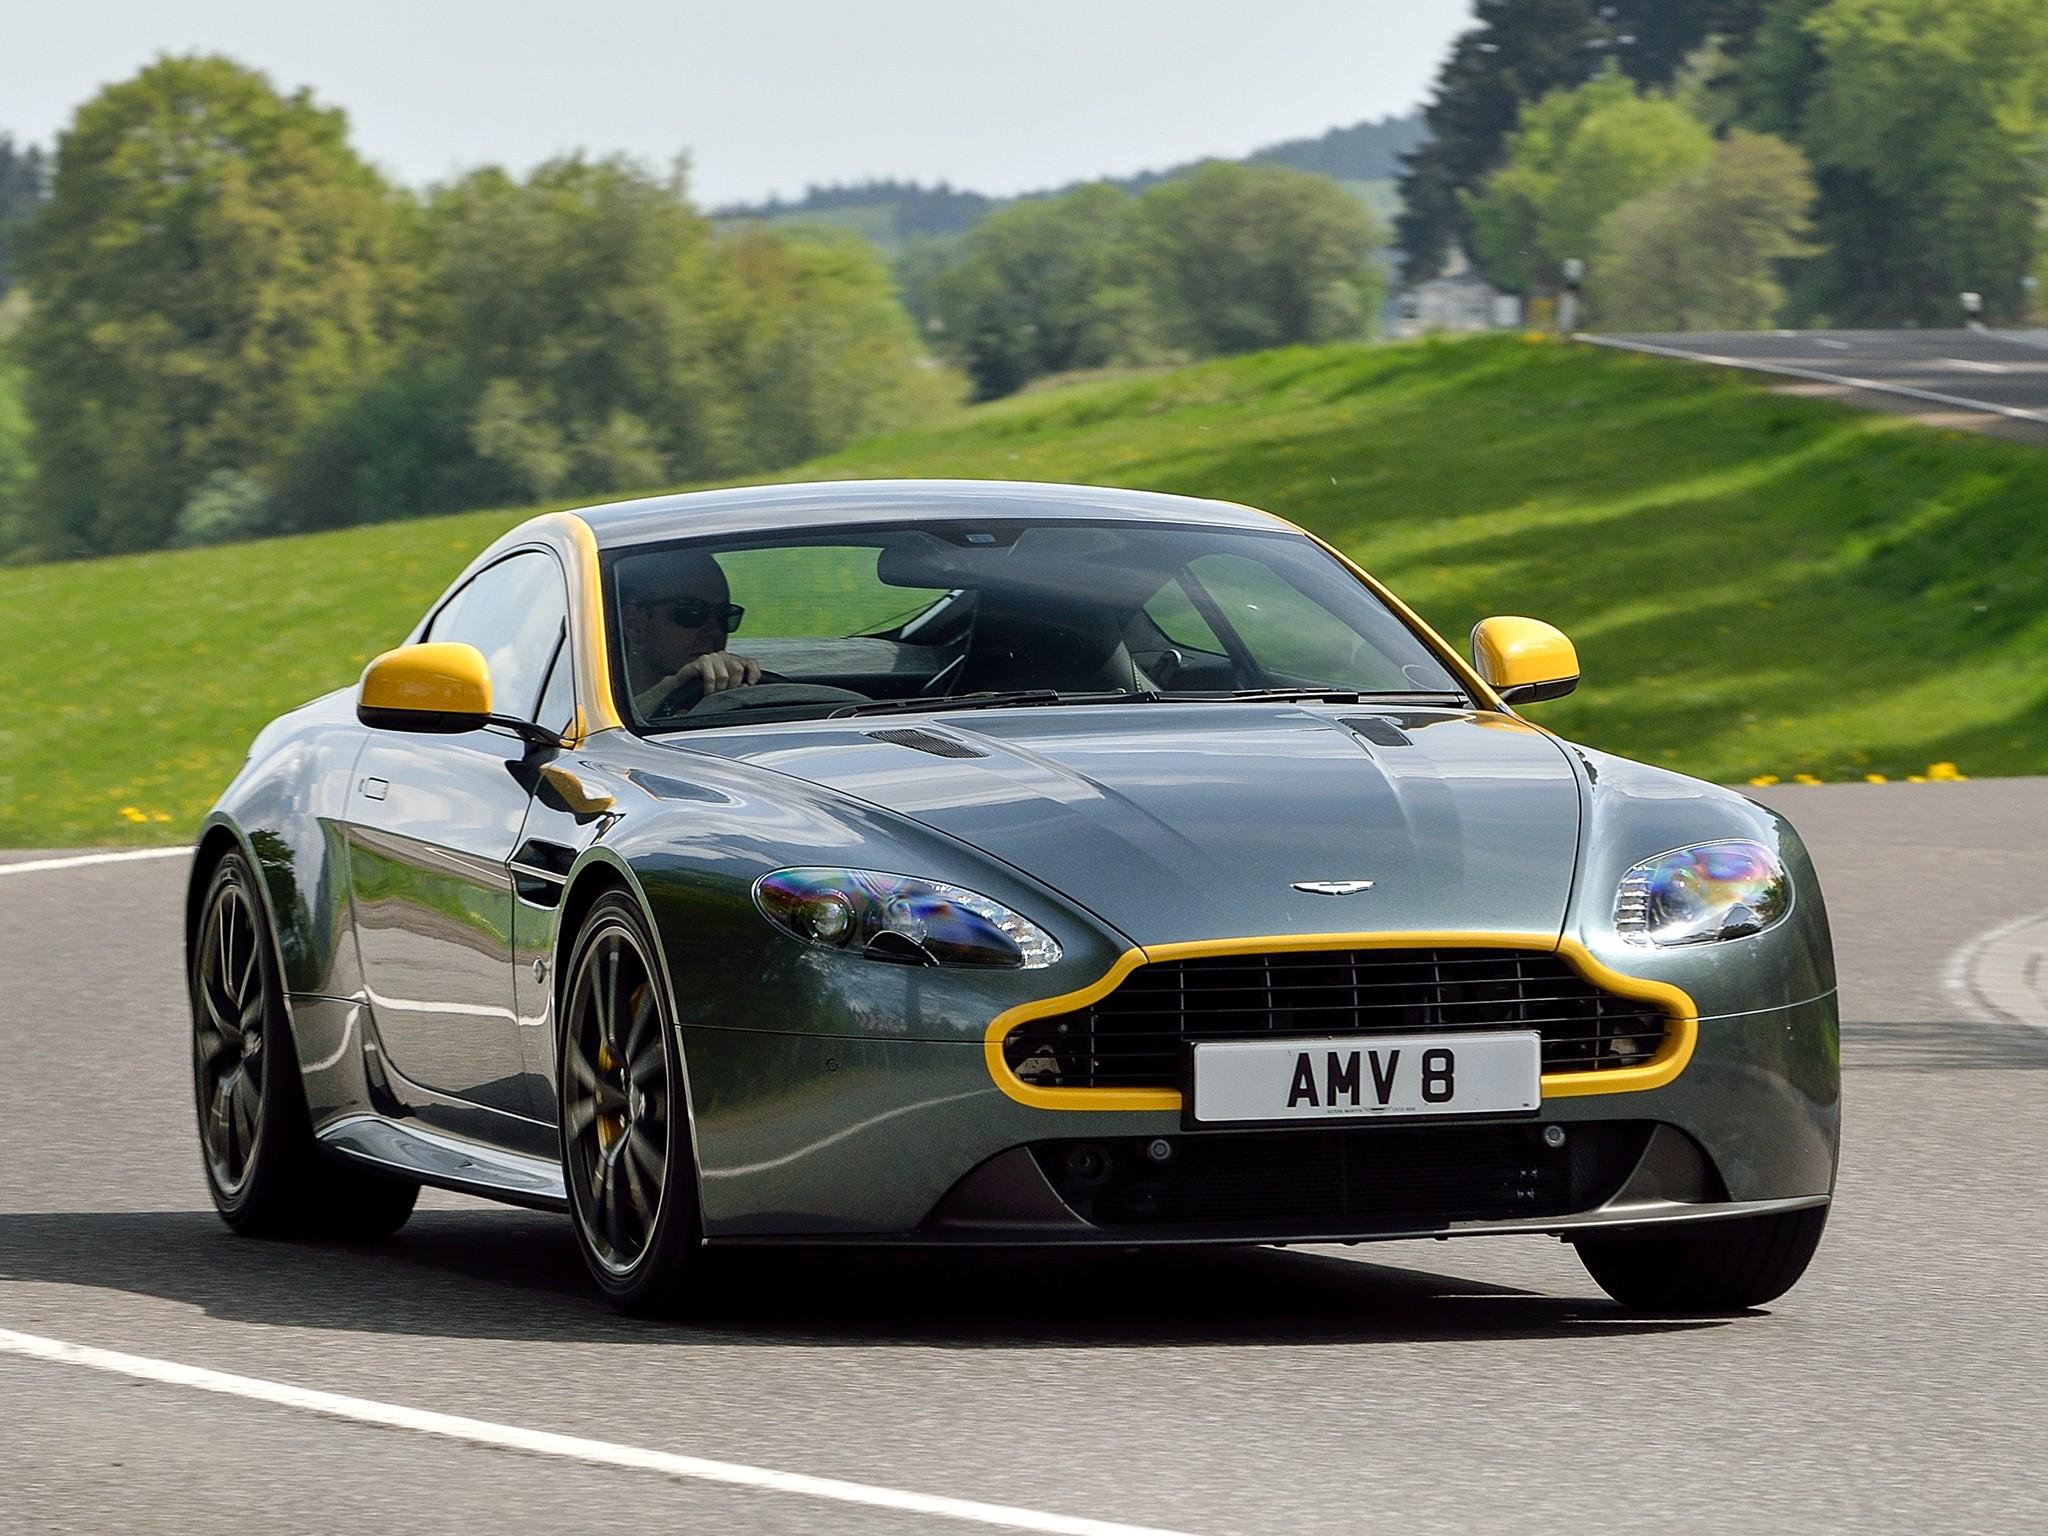 Aston Martin V8 Vantage N430 Details 4 1680x1050 2014 Aston Martin V8 - Aston martin v8 vantage n420 resimleri aston martin v8 vantage n420 4376 42